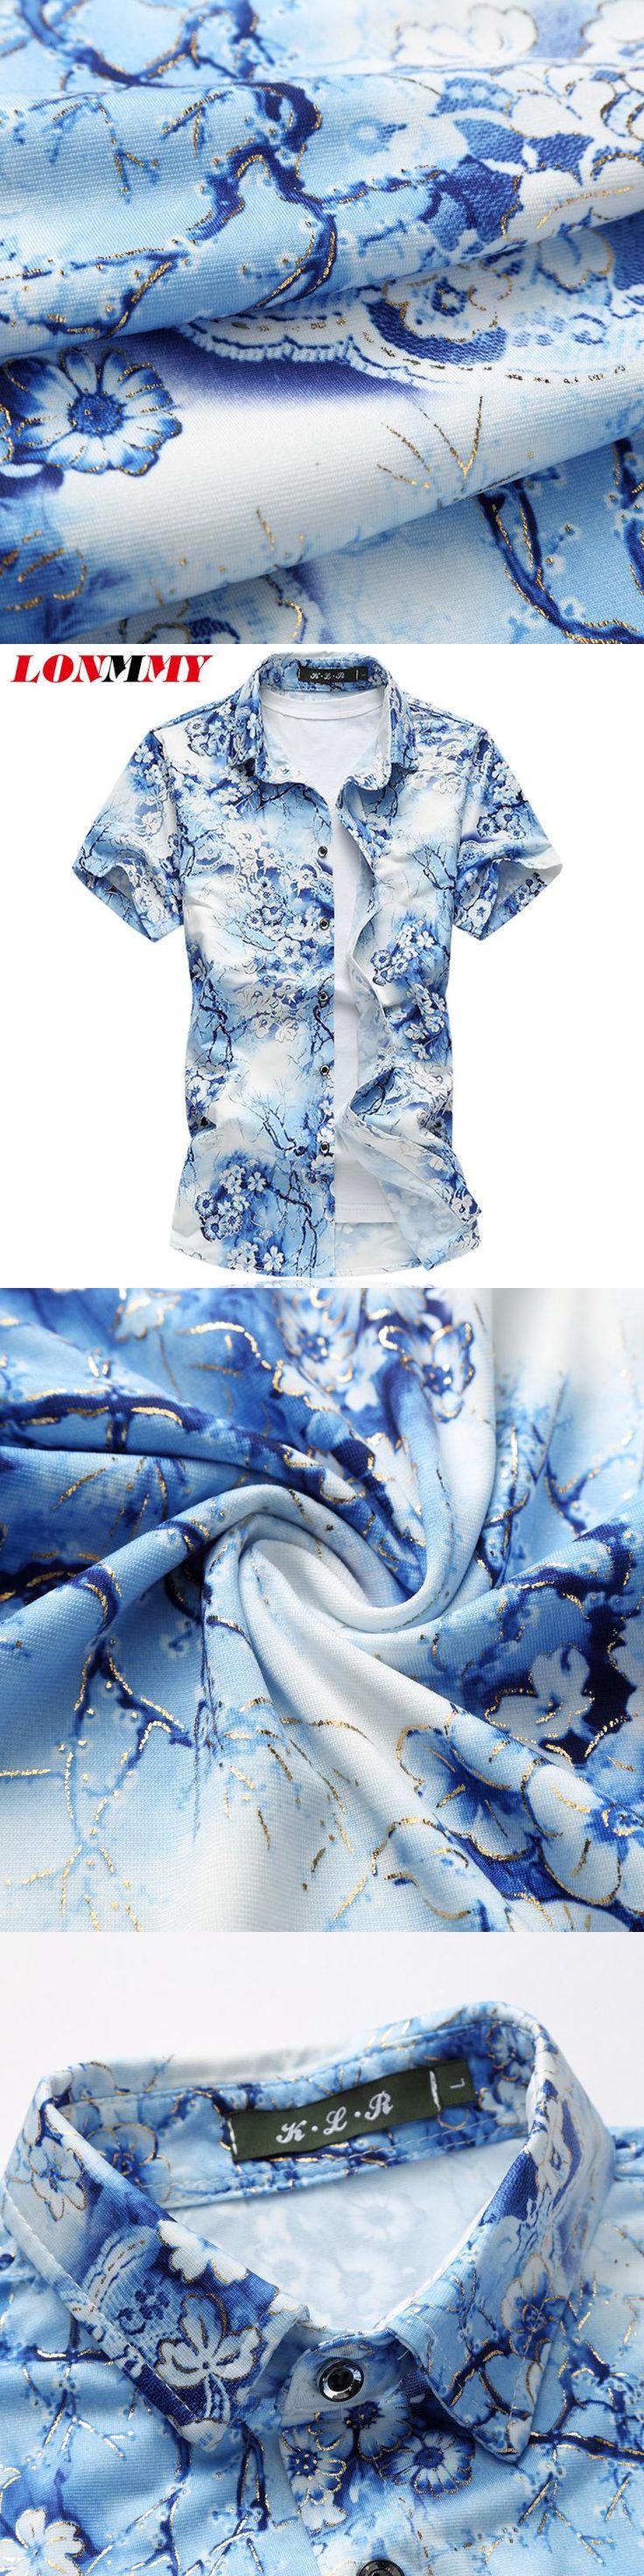 LONMMY PLUS SIZE M-7XL Floral mens silk shirt Mercerized cotton chemise homme flower shirt men Short sleeves mens dress shirts